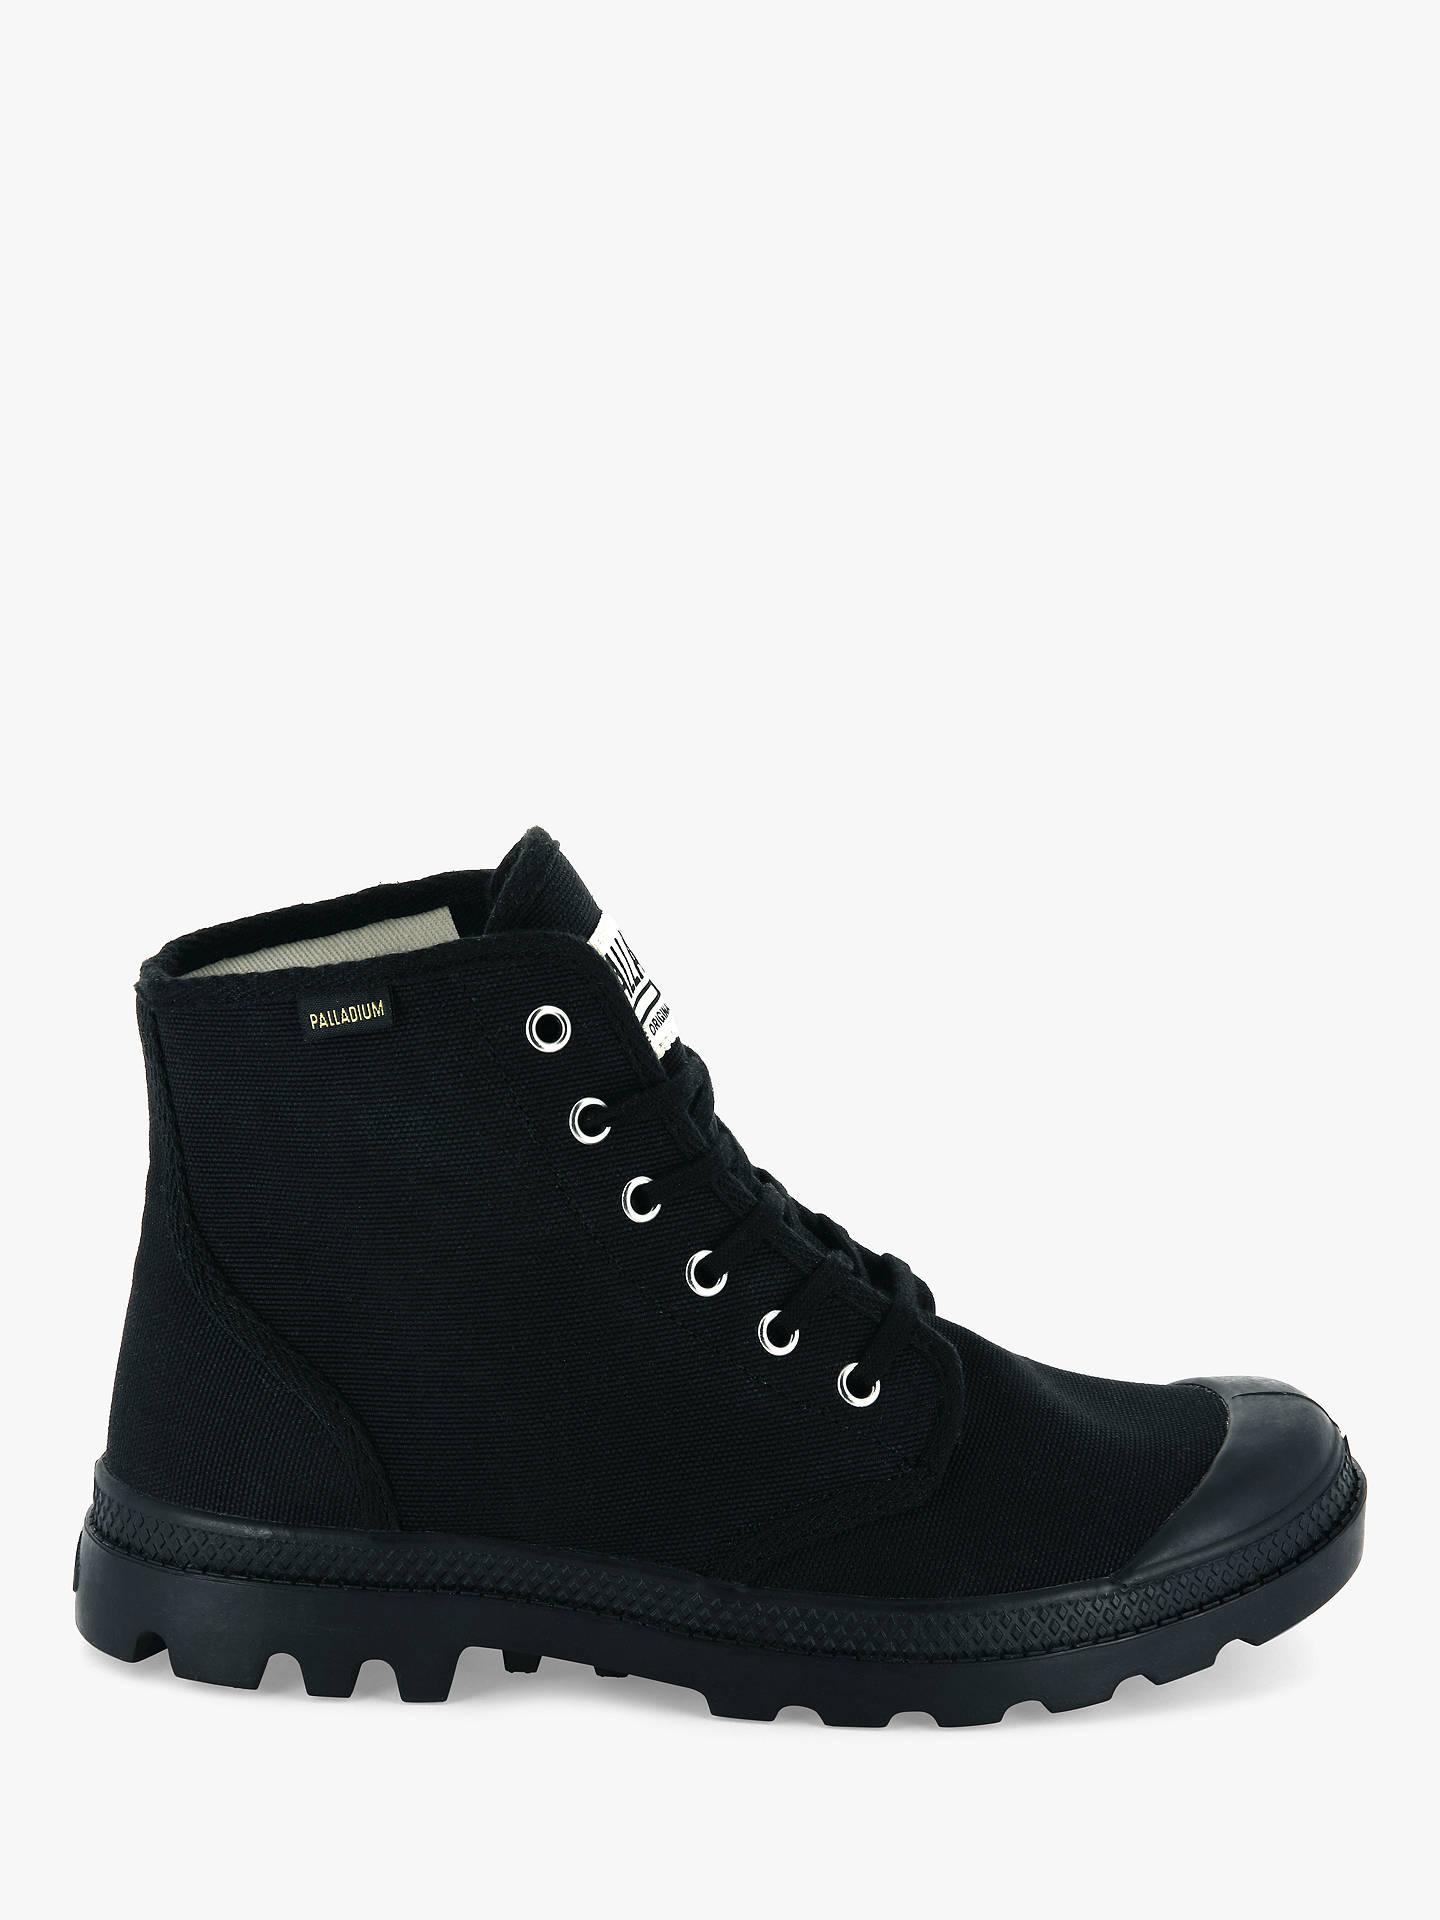 ab9de406eaa Palladium Pampa Hi Originale Canvas Boots, Black